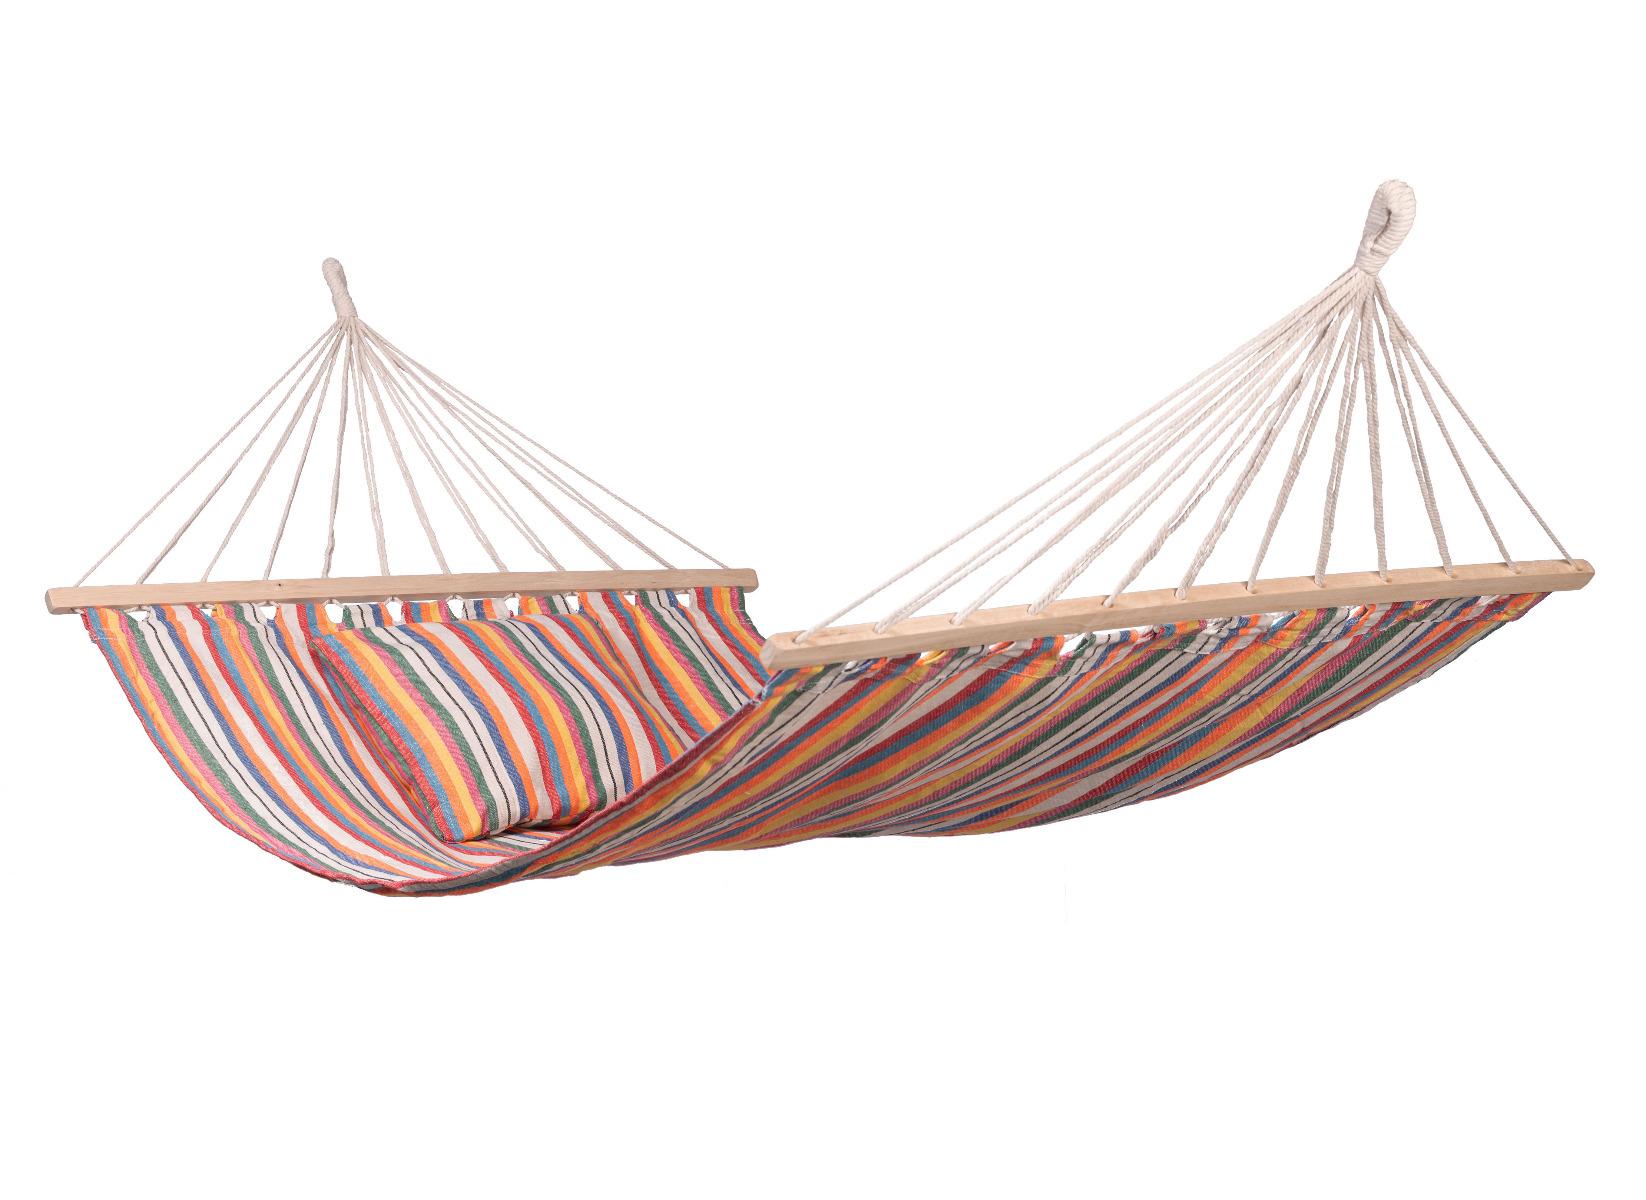 'Isla' Spreaderbar E�npersoons Hangmat - Veelkleurig - 123 Hammock